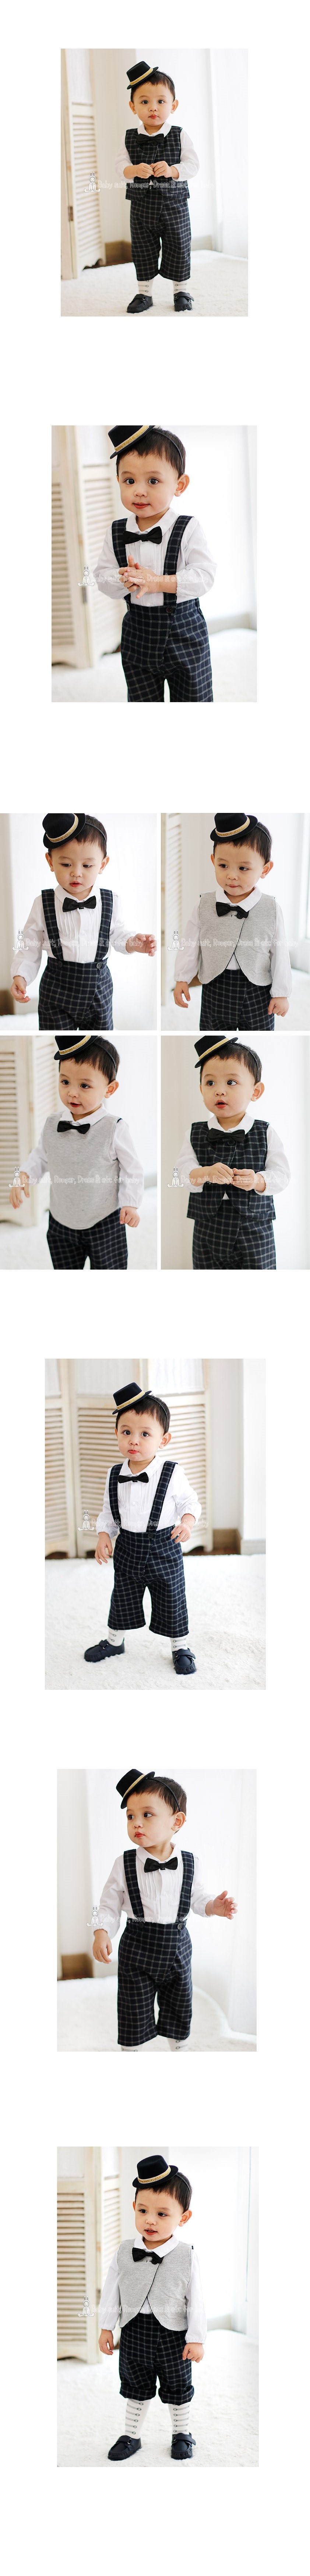 [ BABYMAX ] Jude Reversible Suit 1284